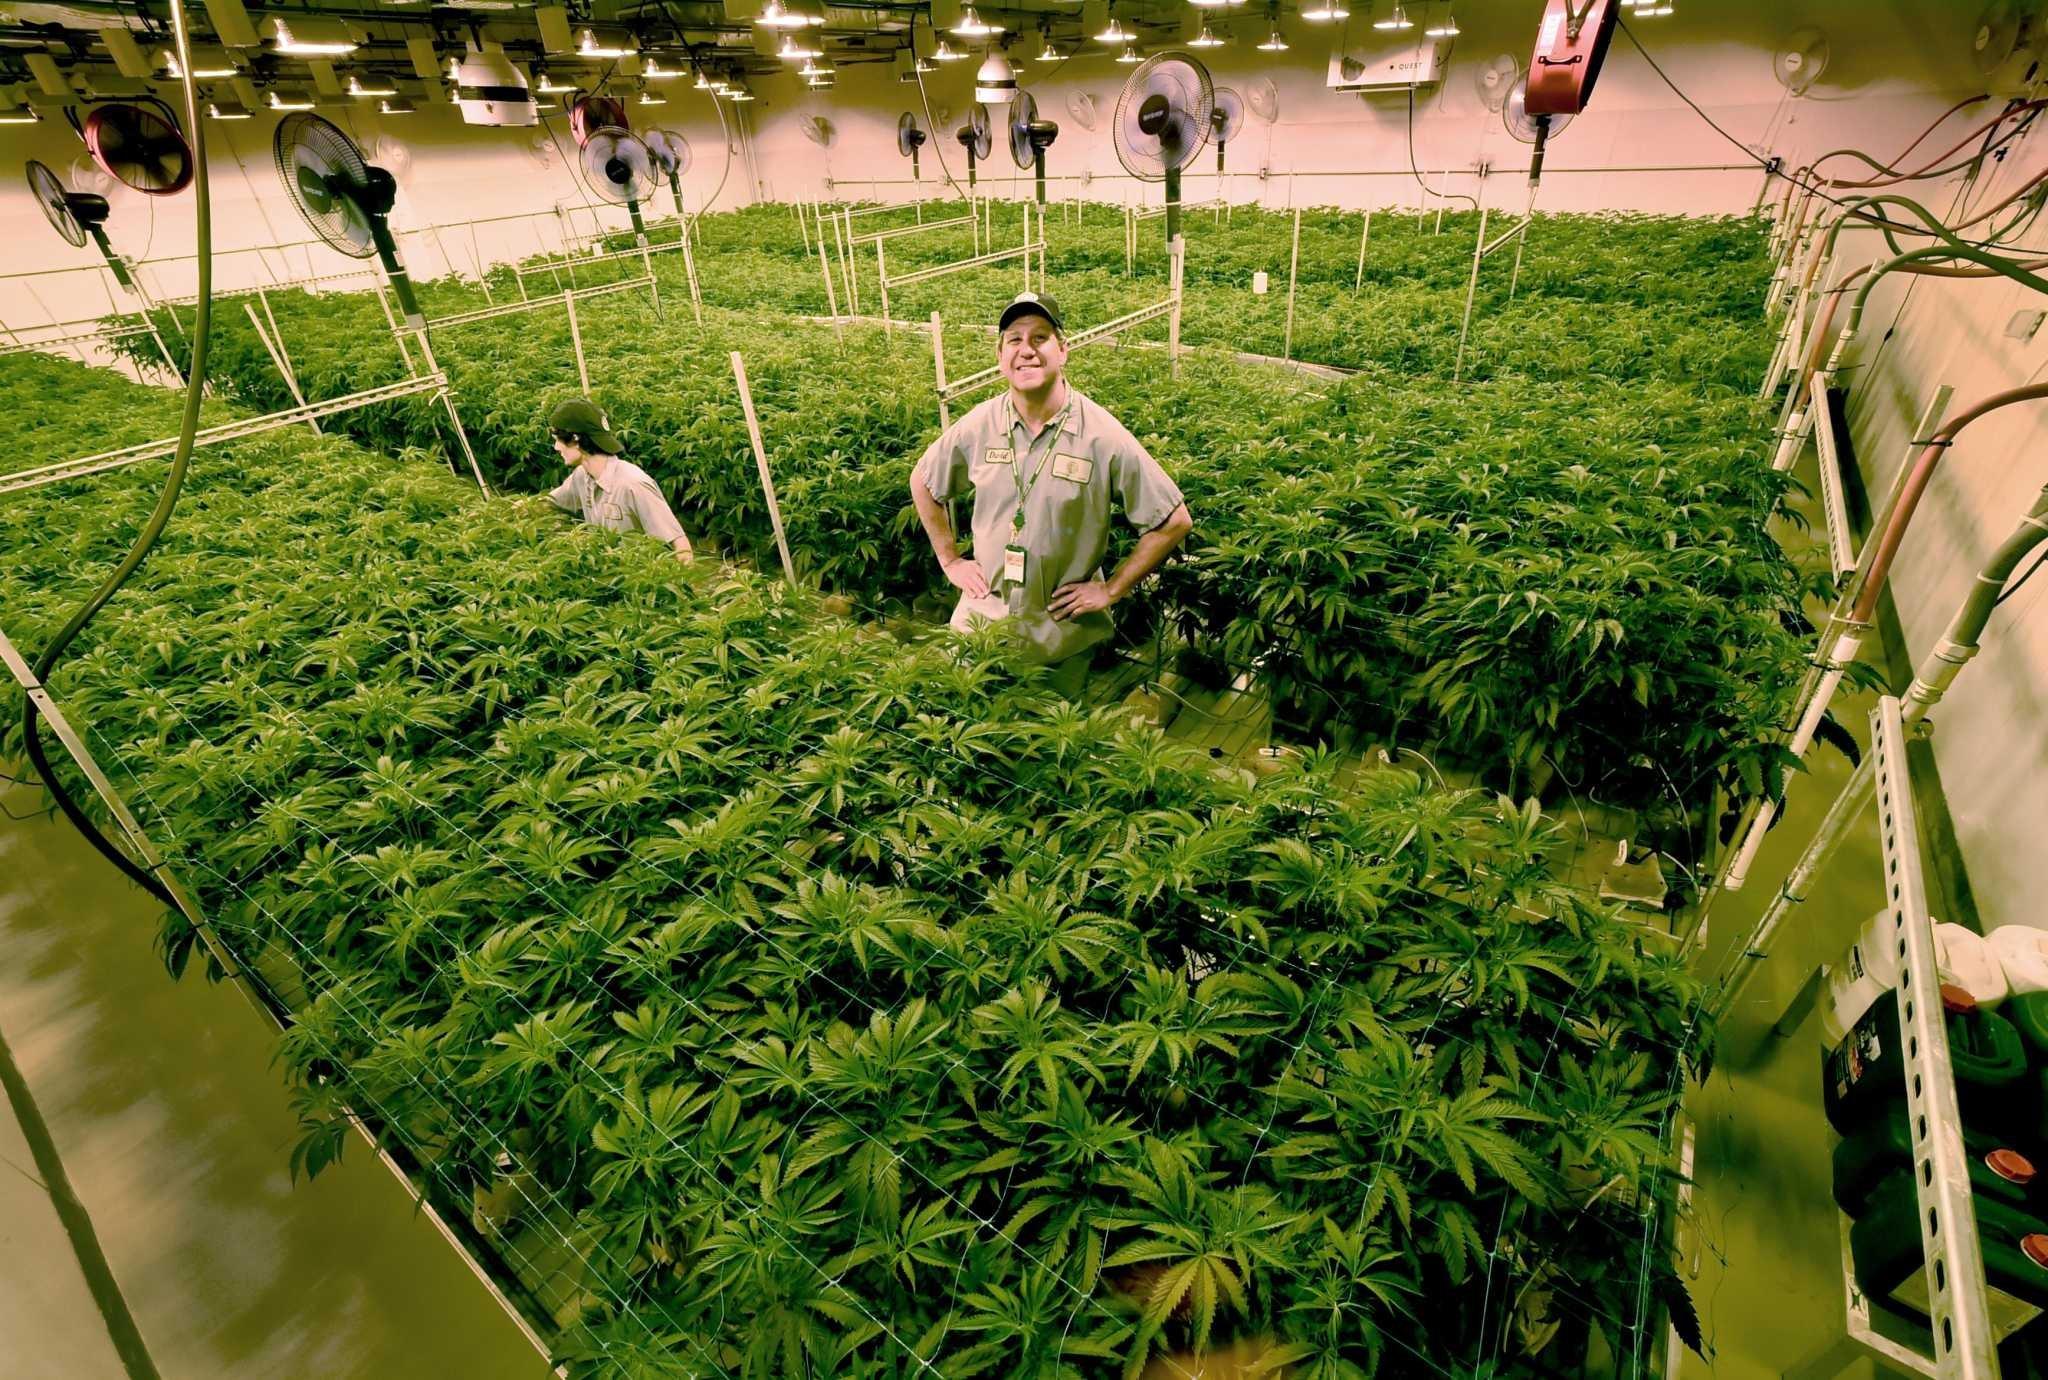 Legalizing recreational marijuana debate grows in CT